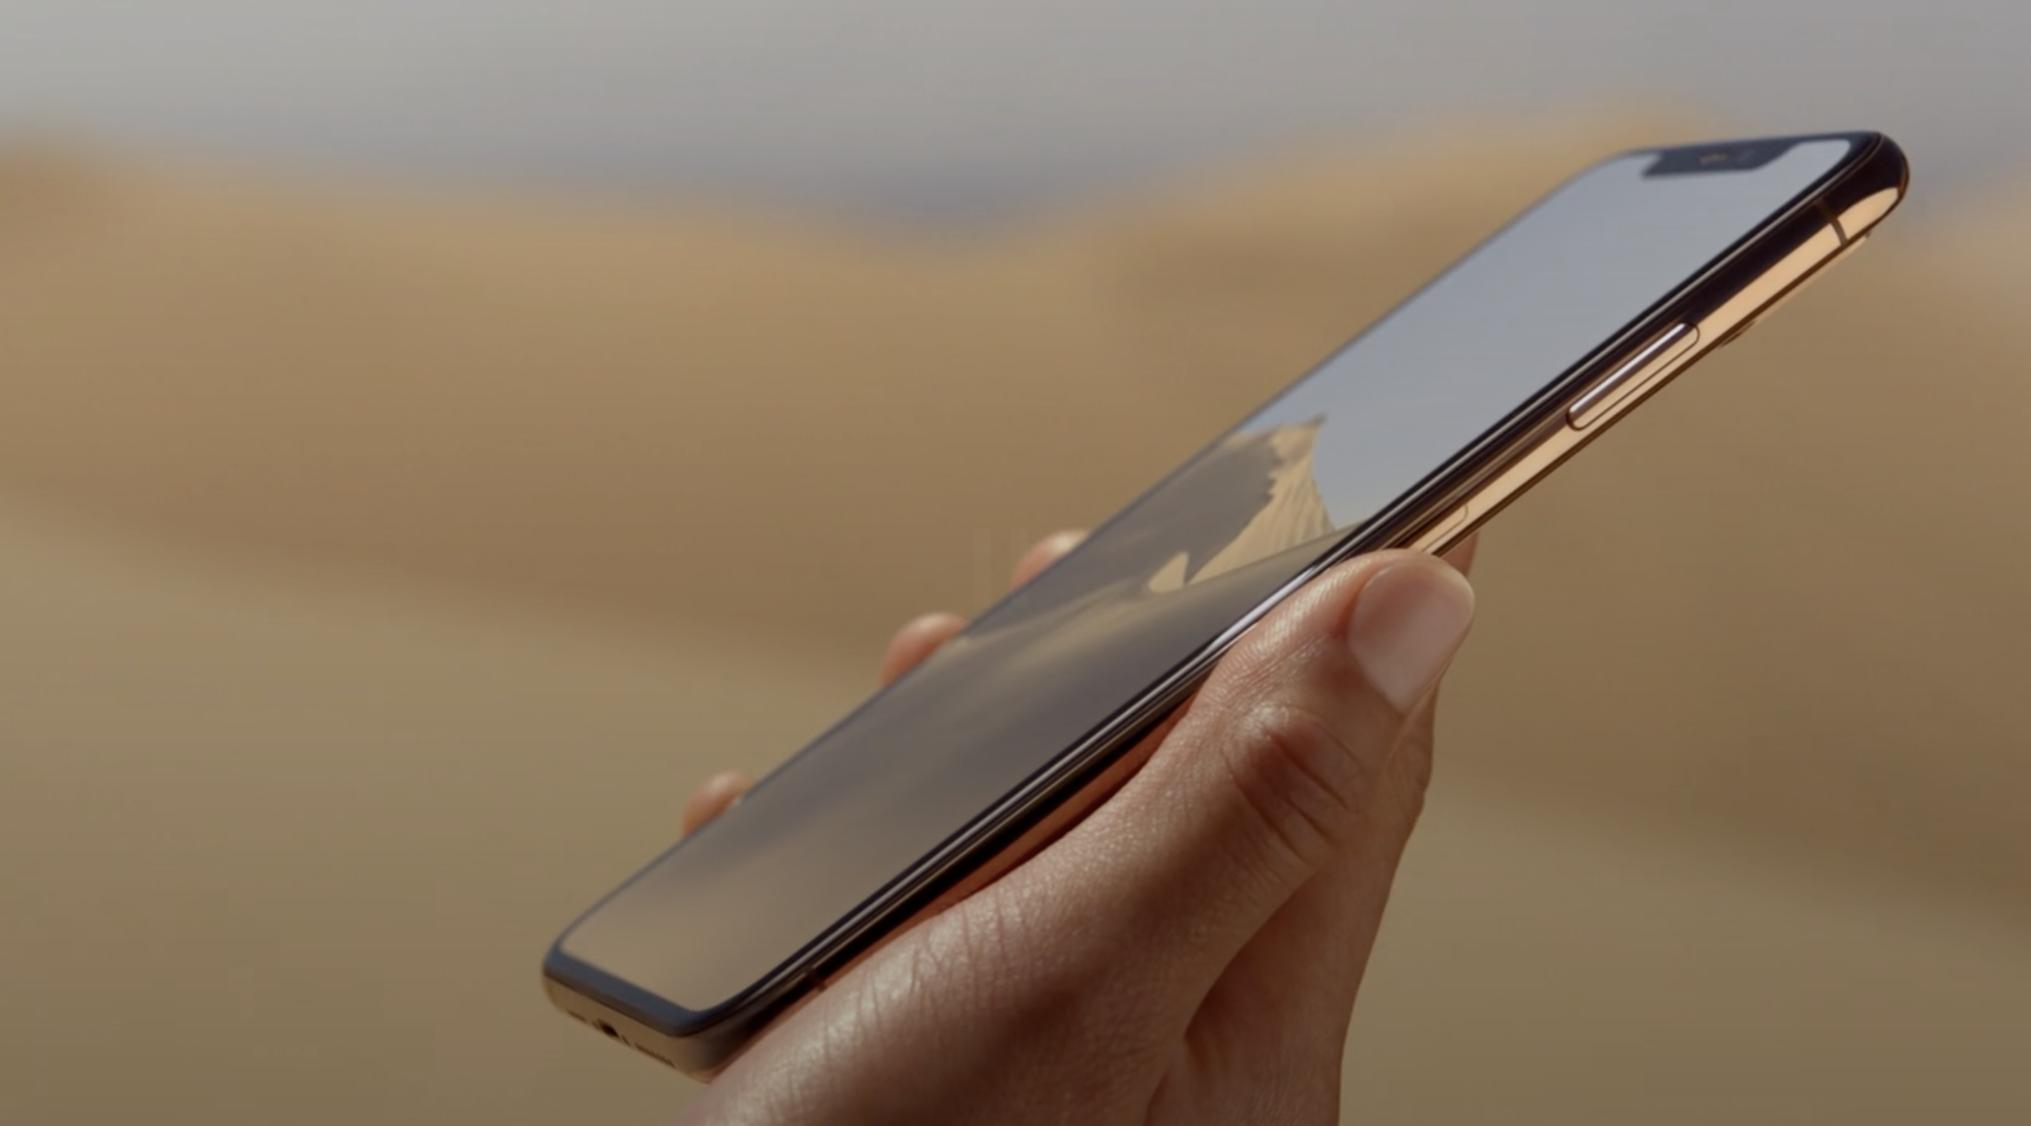 Ремонт iPhone XS Max - фото 1 | Сервисный центр Total Apple